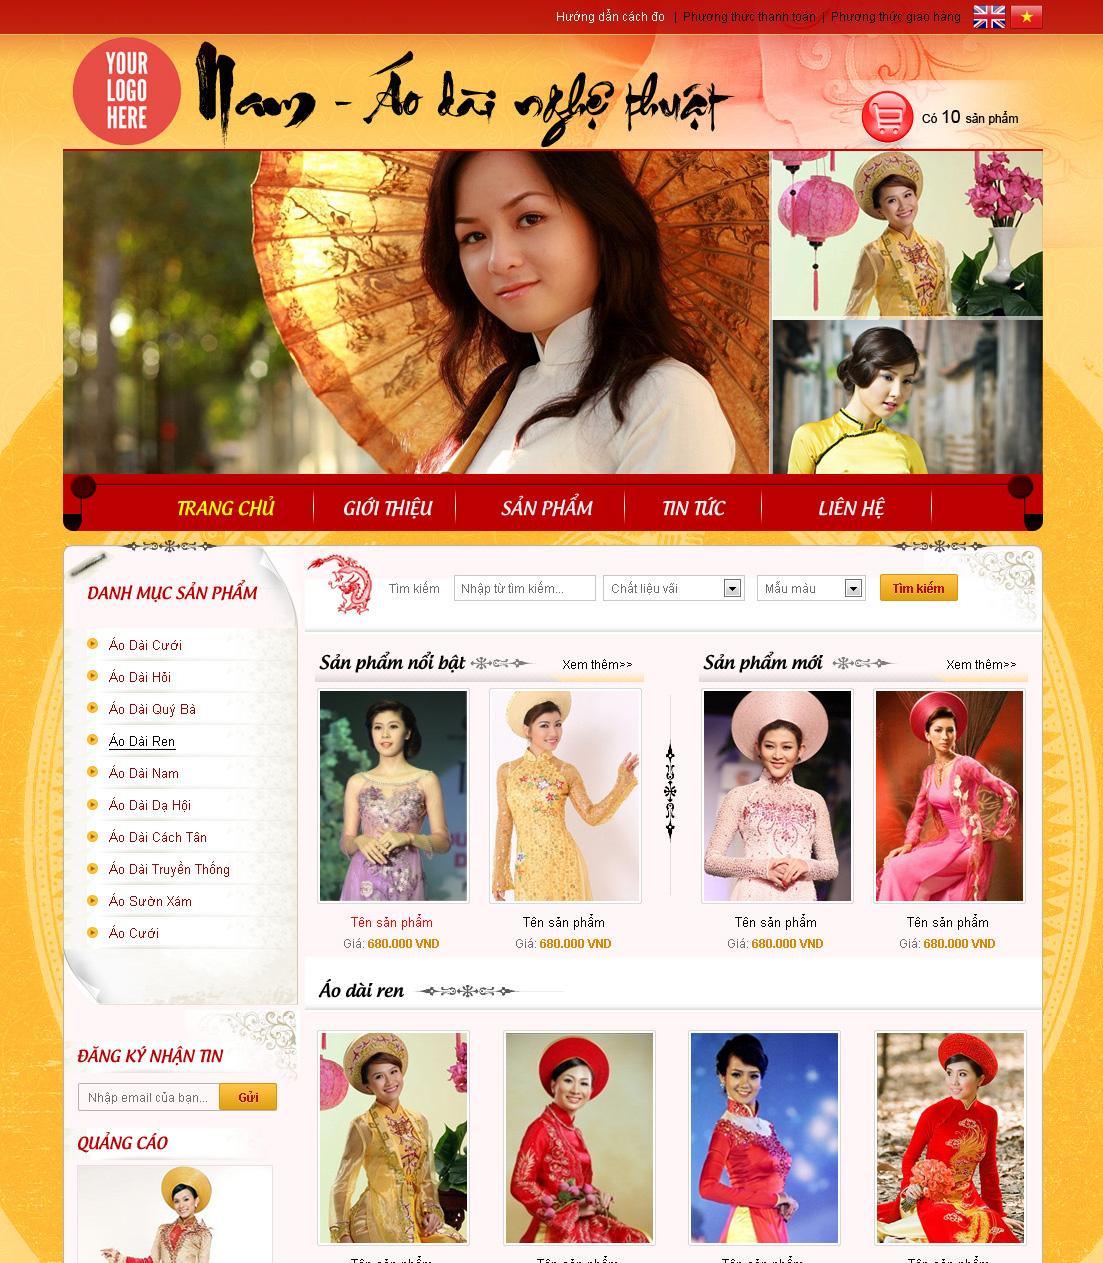 website thời trang5